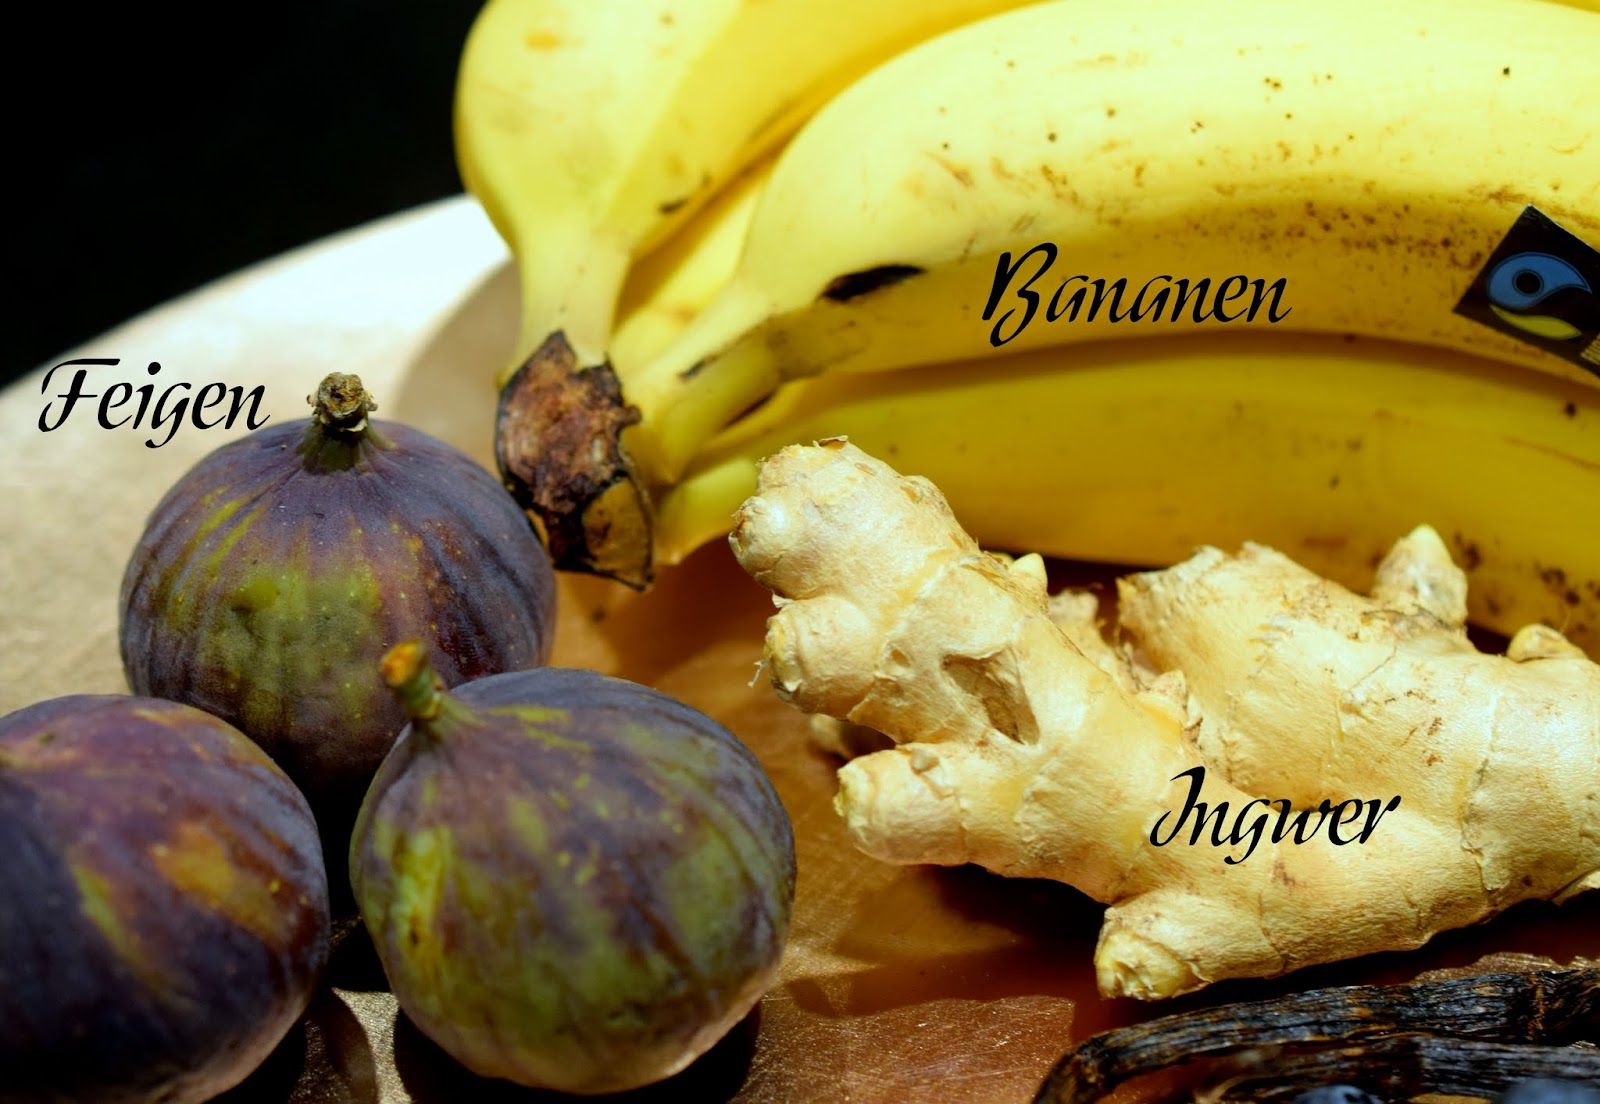 Top 10 Mood Foods Feigen Bananen Ingwer